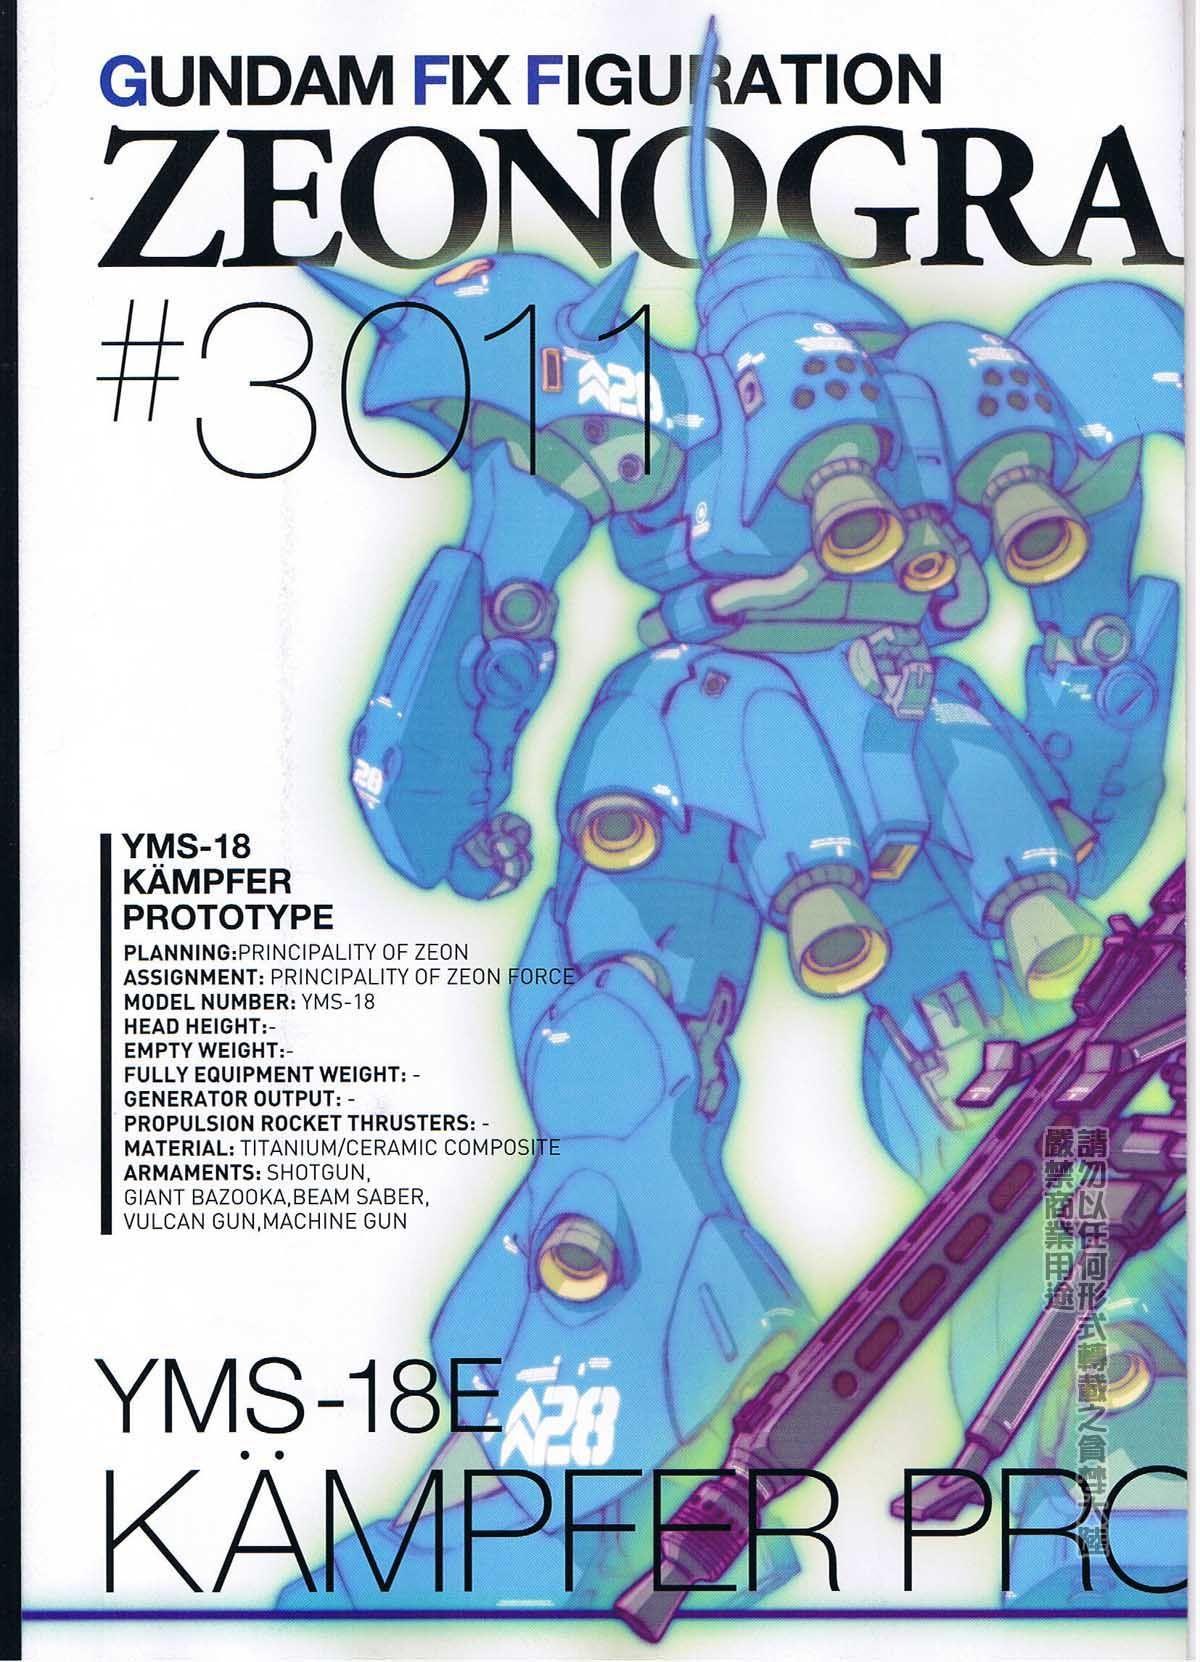 YMS-18 Kämpfer Prototype - The Gundam Wiki - Wikia